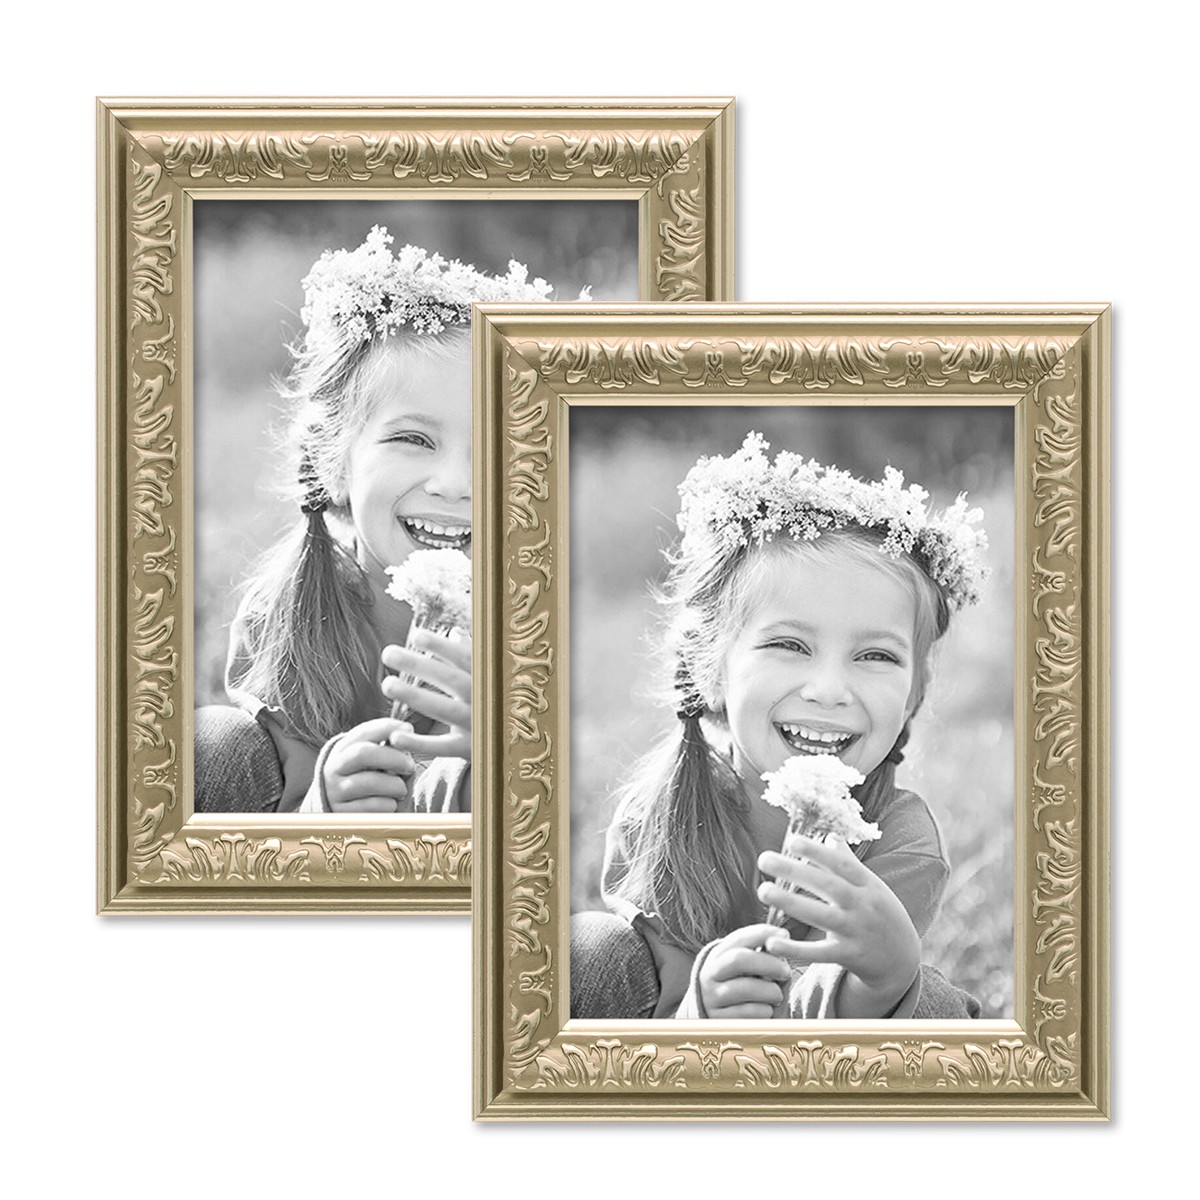 2er set bilderrahmen antik silber nostalgie 10x15 cm